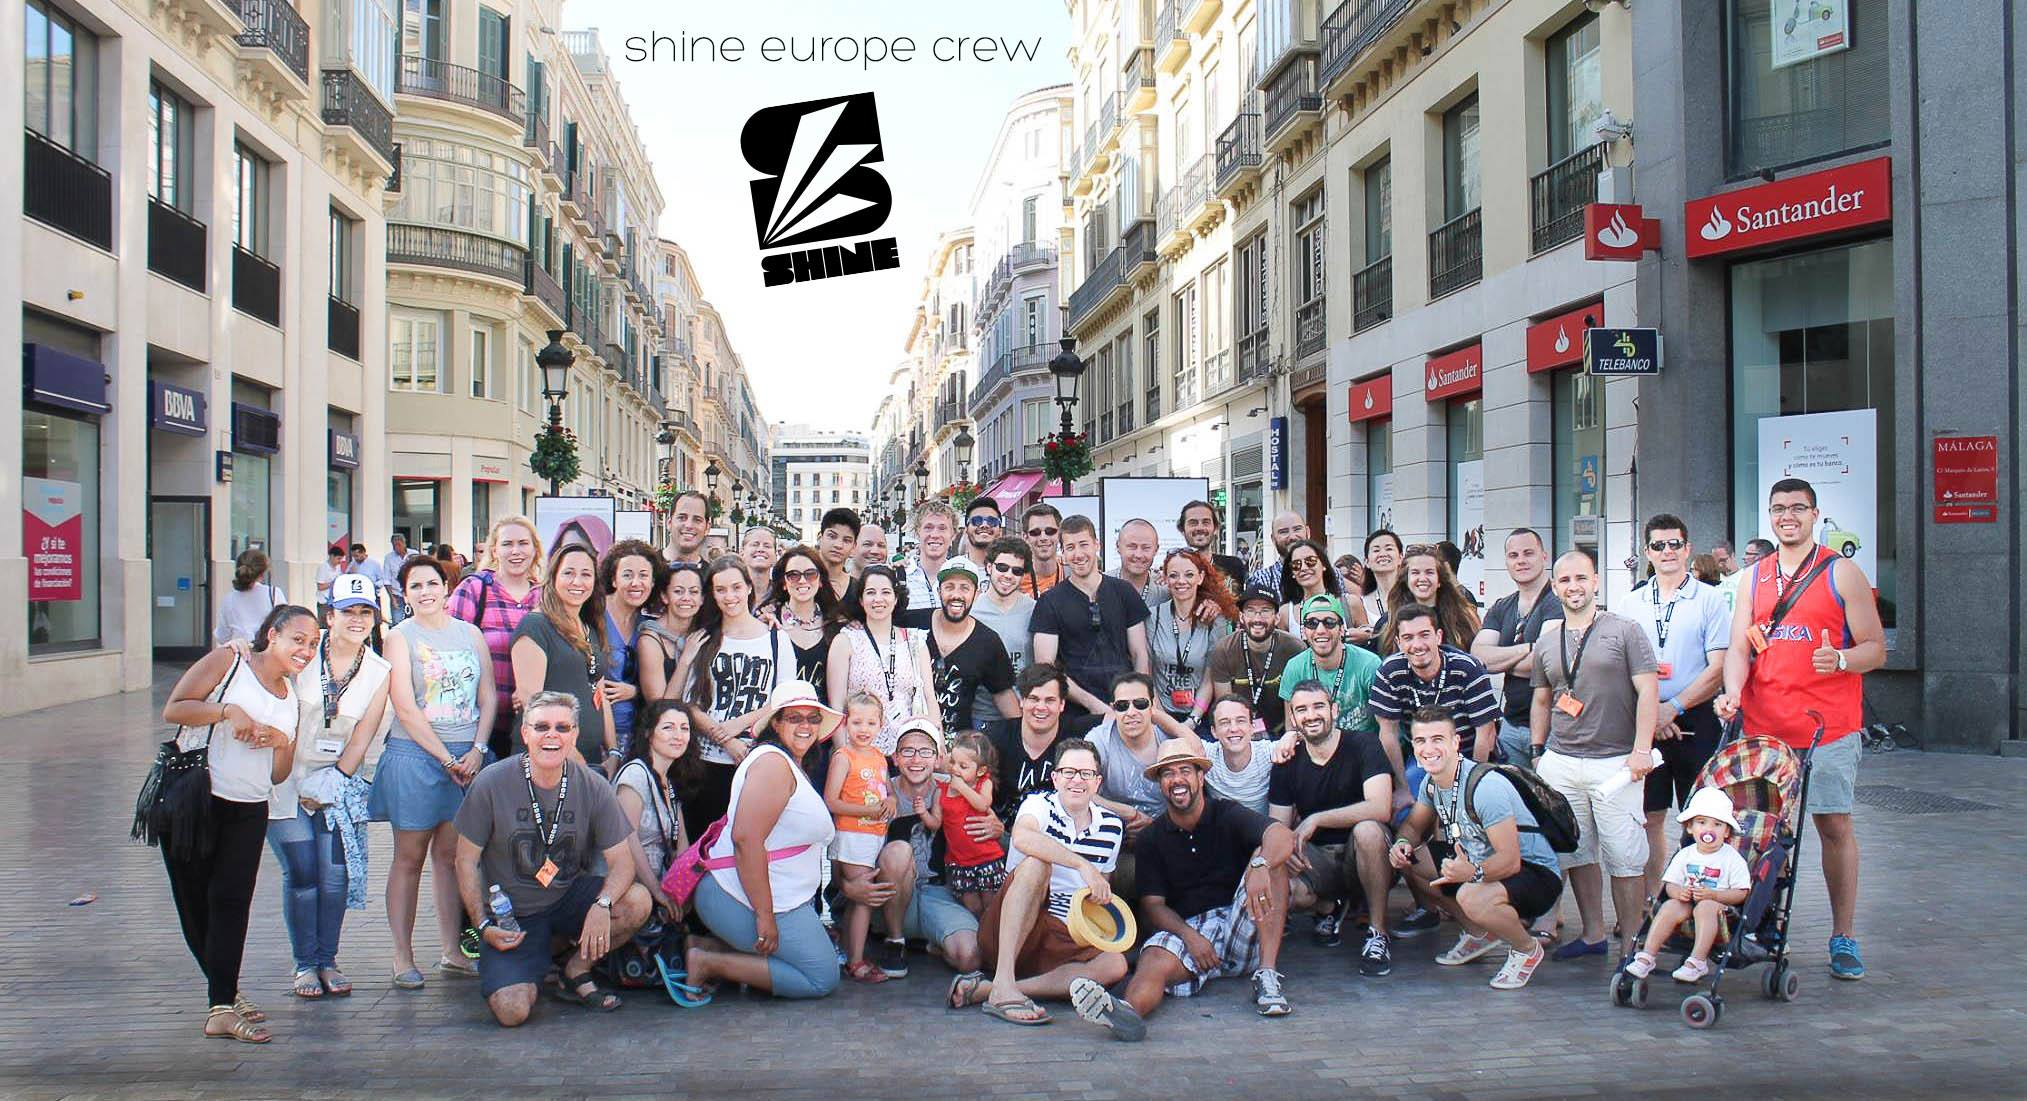 shine europe crew